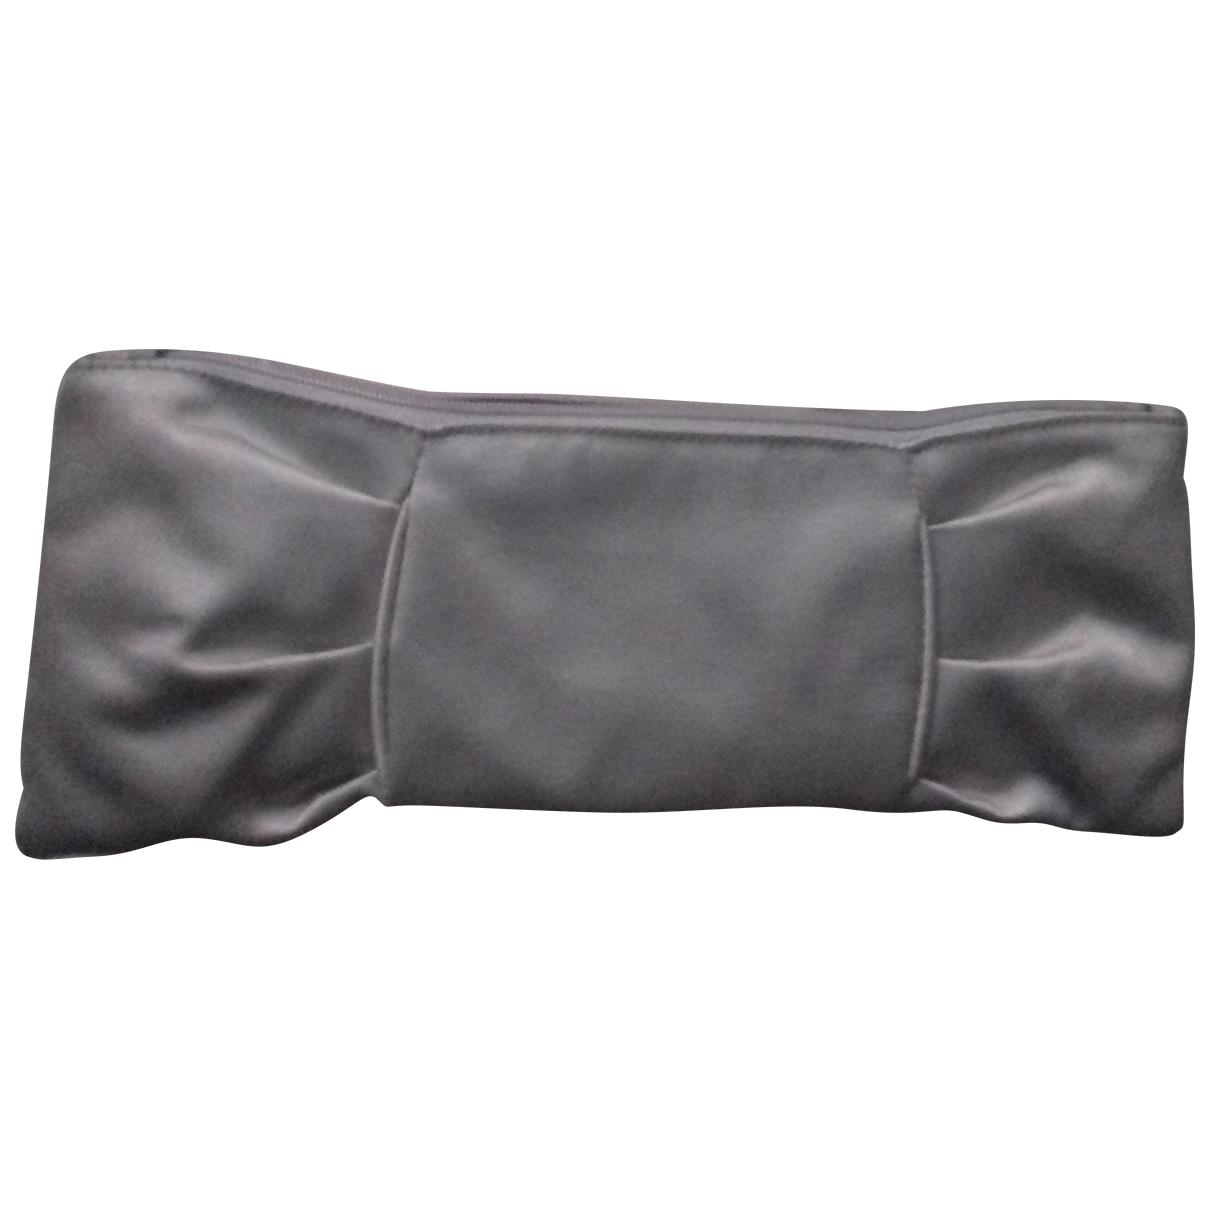 Brontibay \N Silver Clutch bag for Women \N